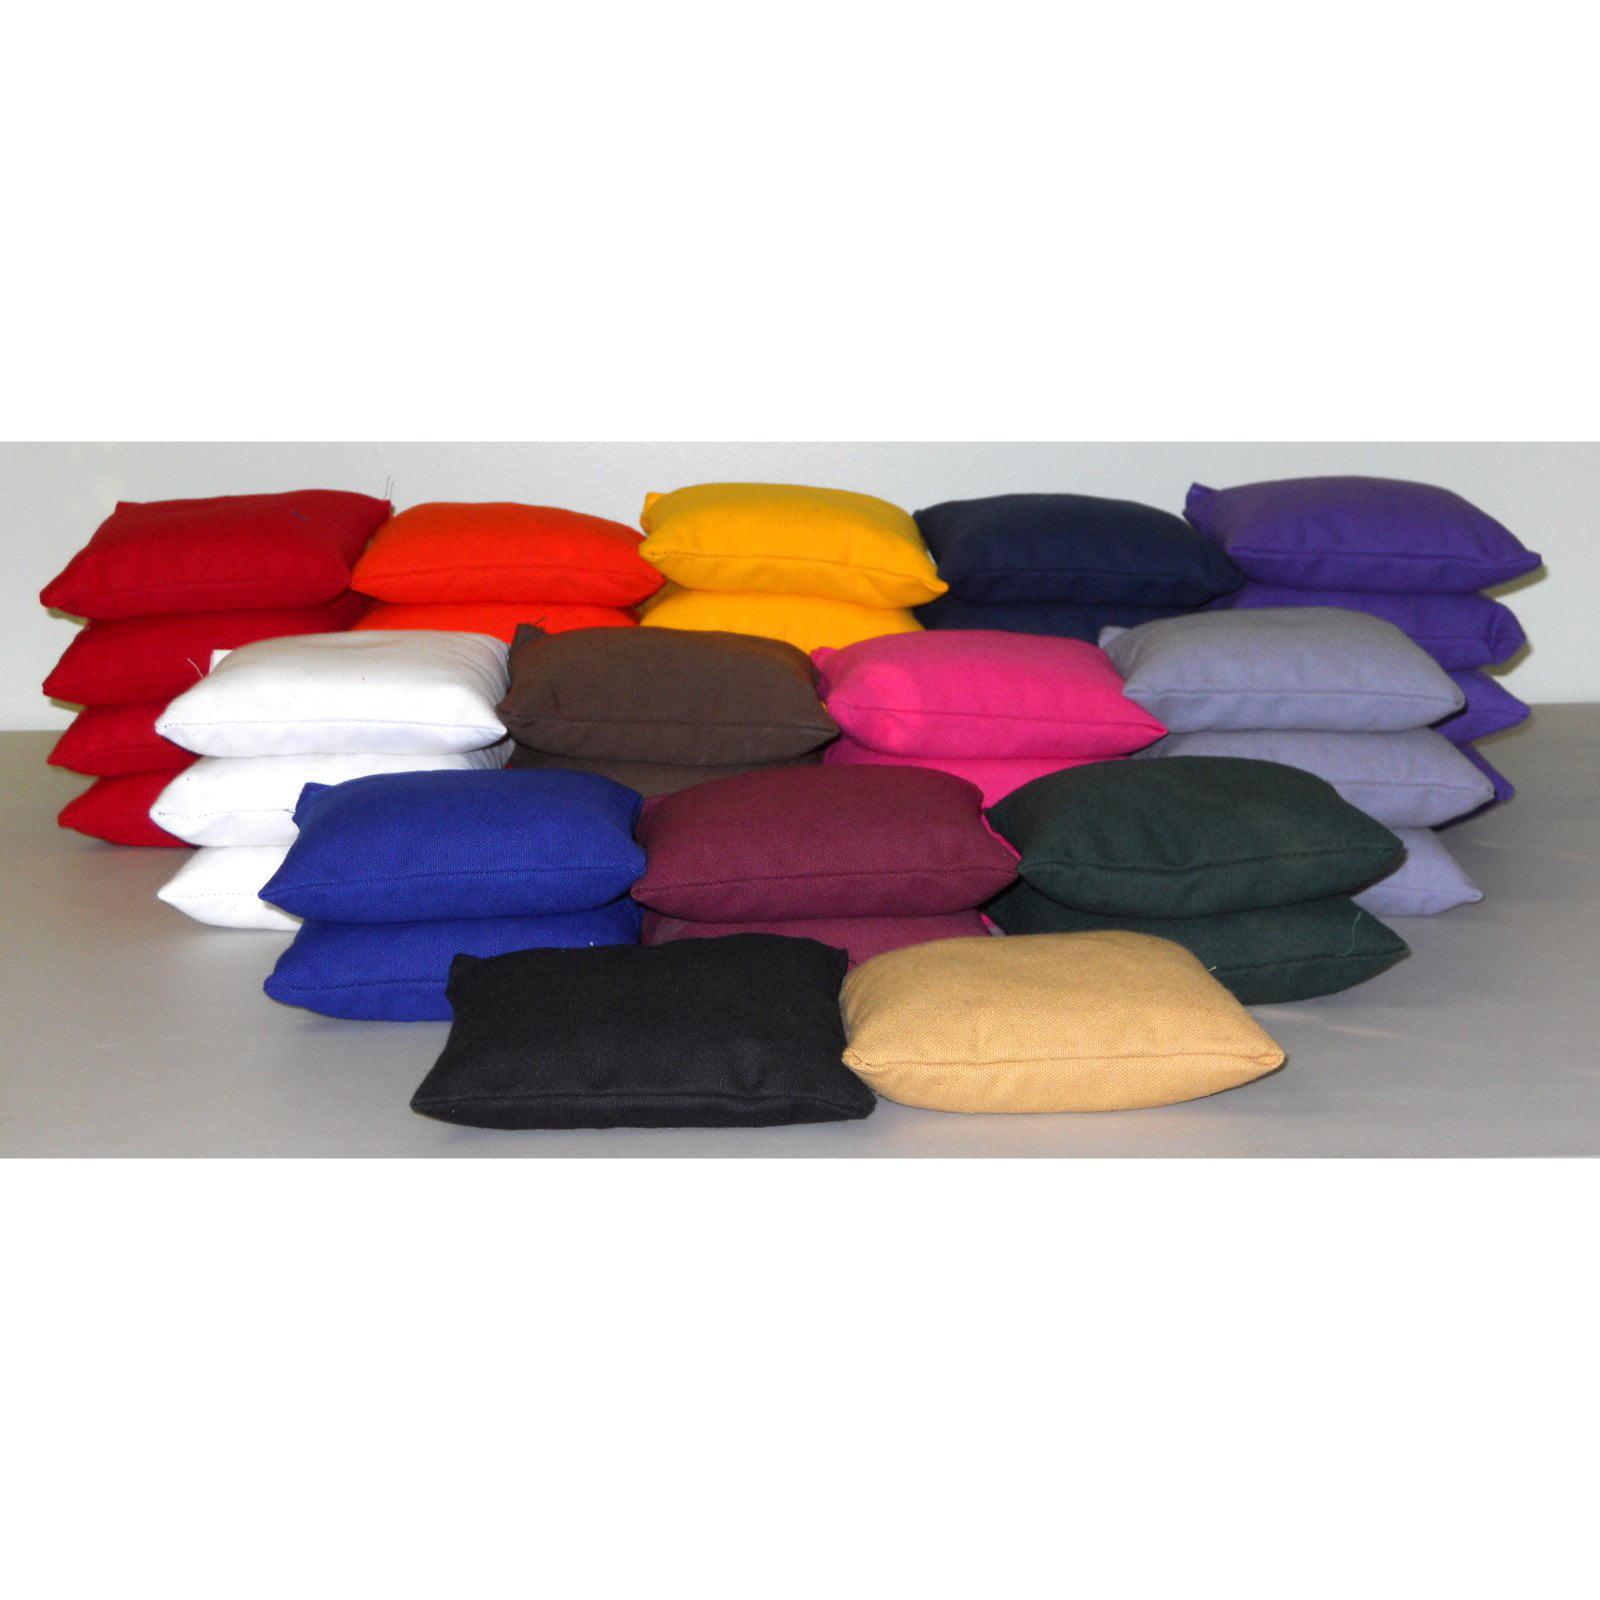 Tournament Cornhole Bags - Set of 4